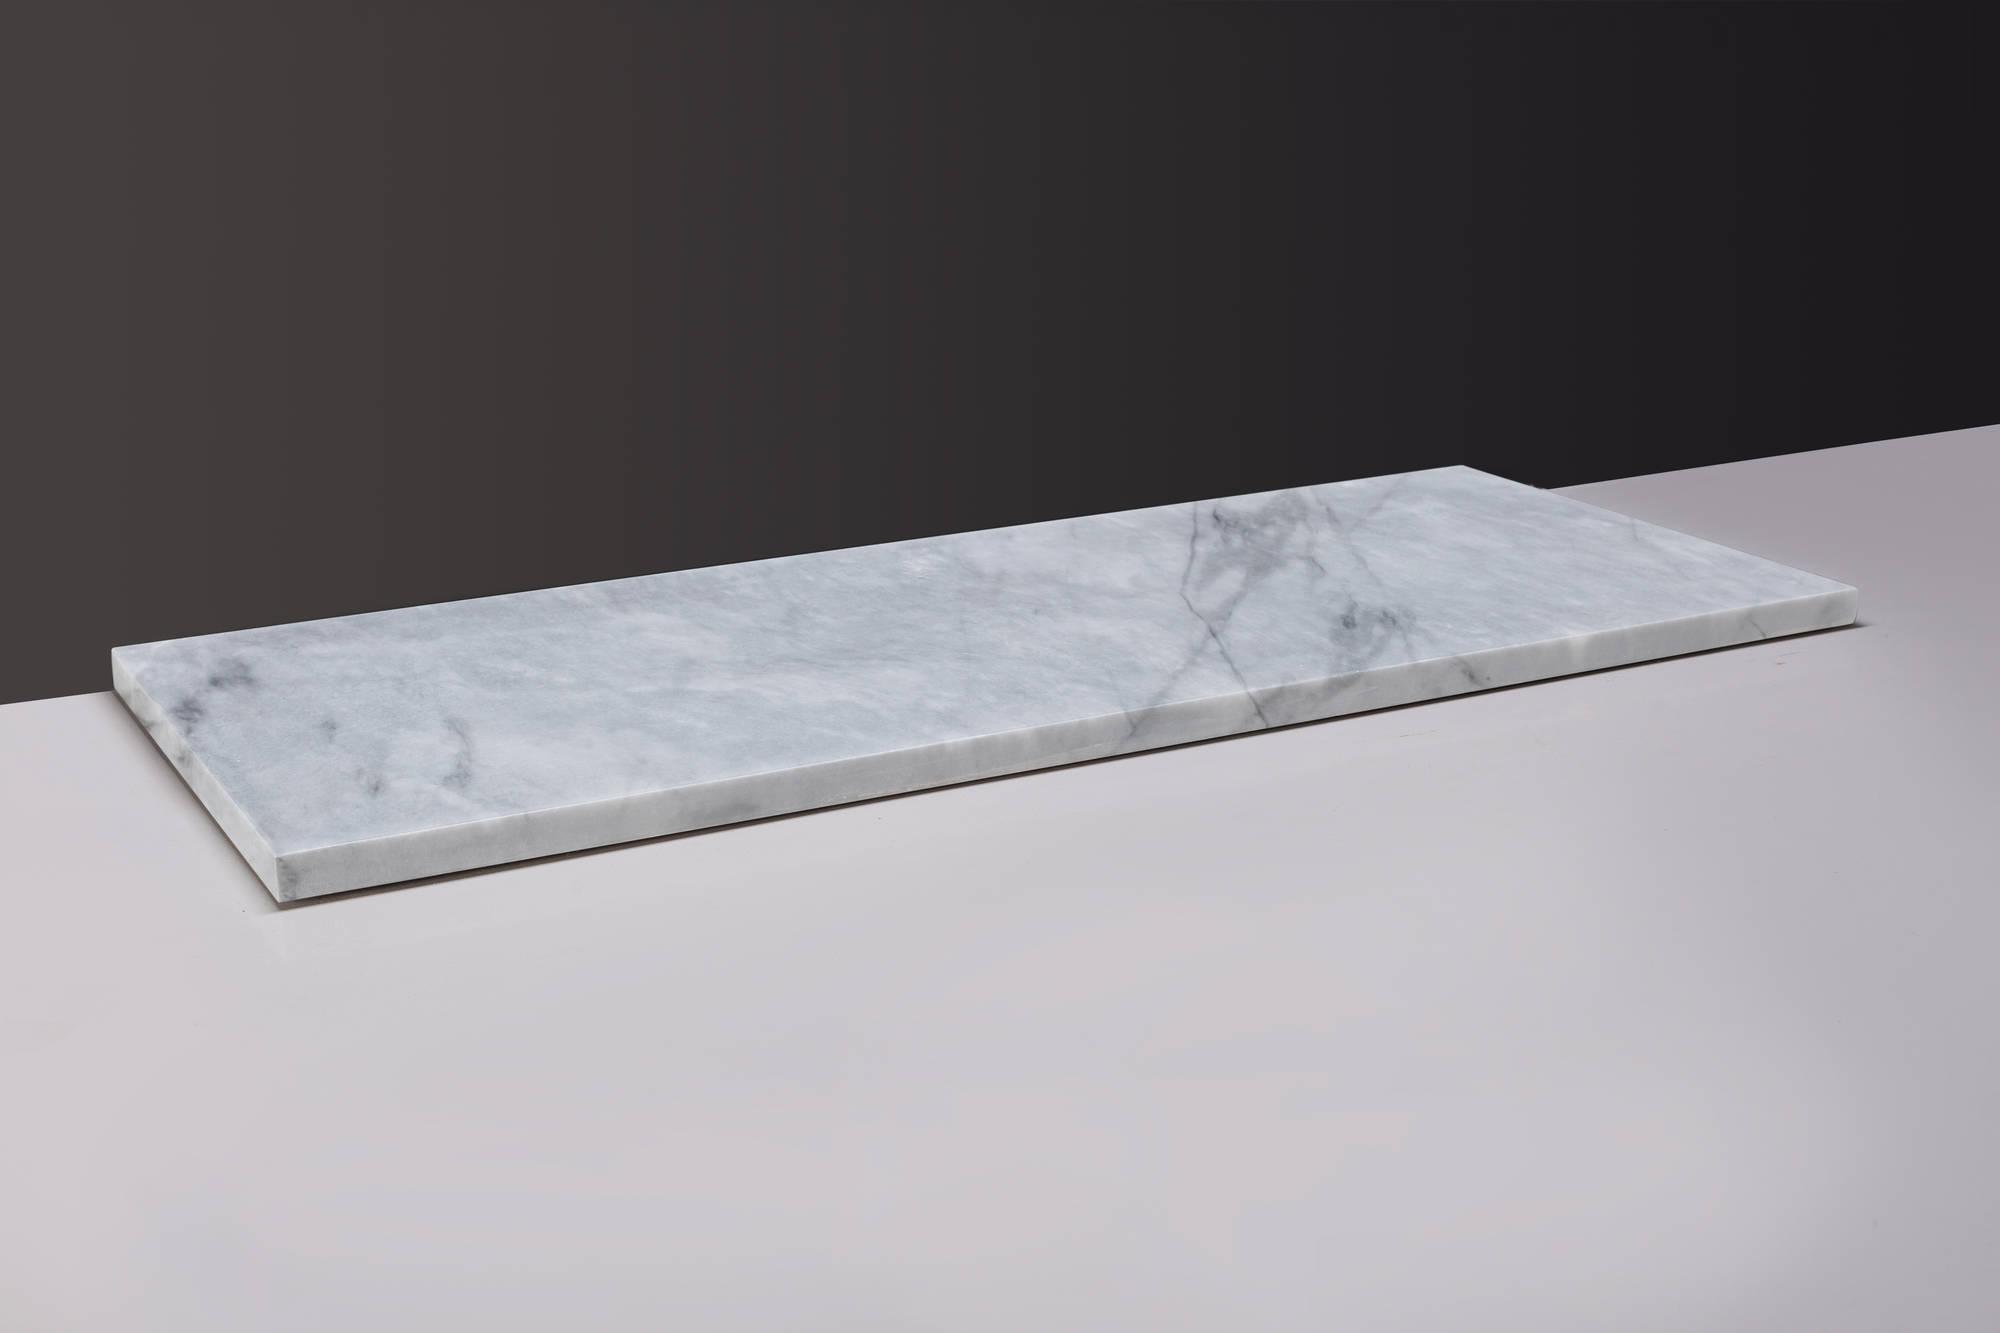 Productafbeelding van Forzalaqua Wastafelblad 60,5x51,5x3 cm Carrara Marmer Gepolijst